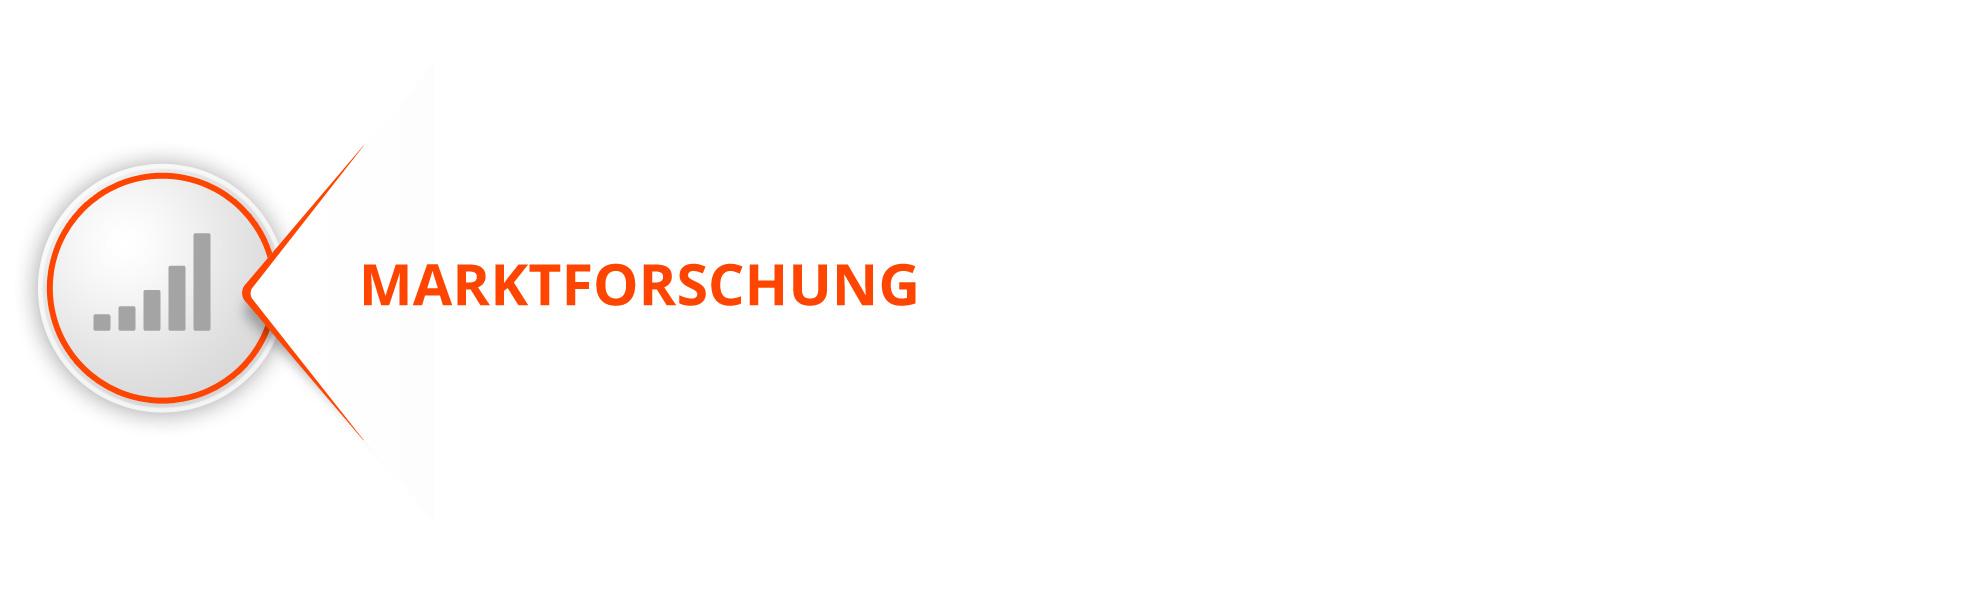 marktforschung-azobit